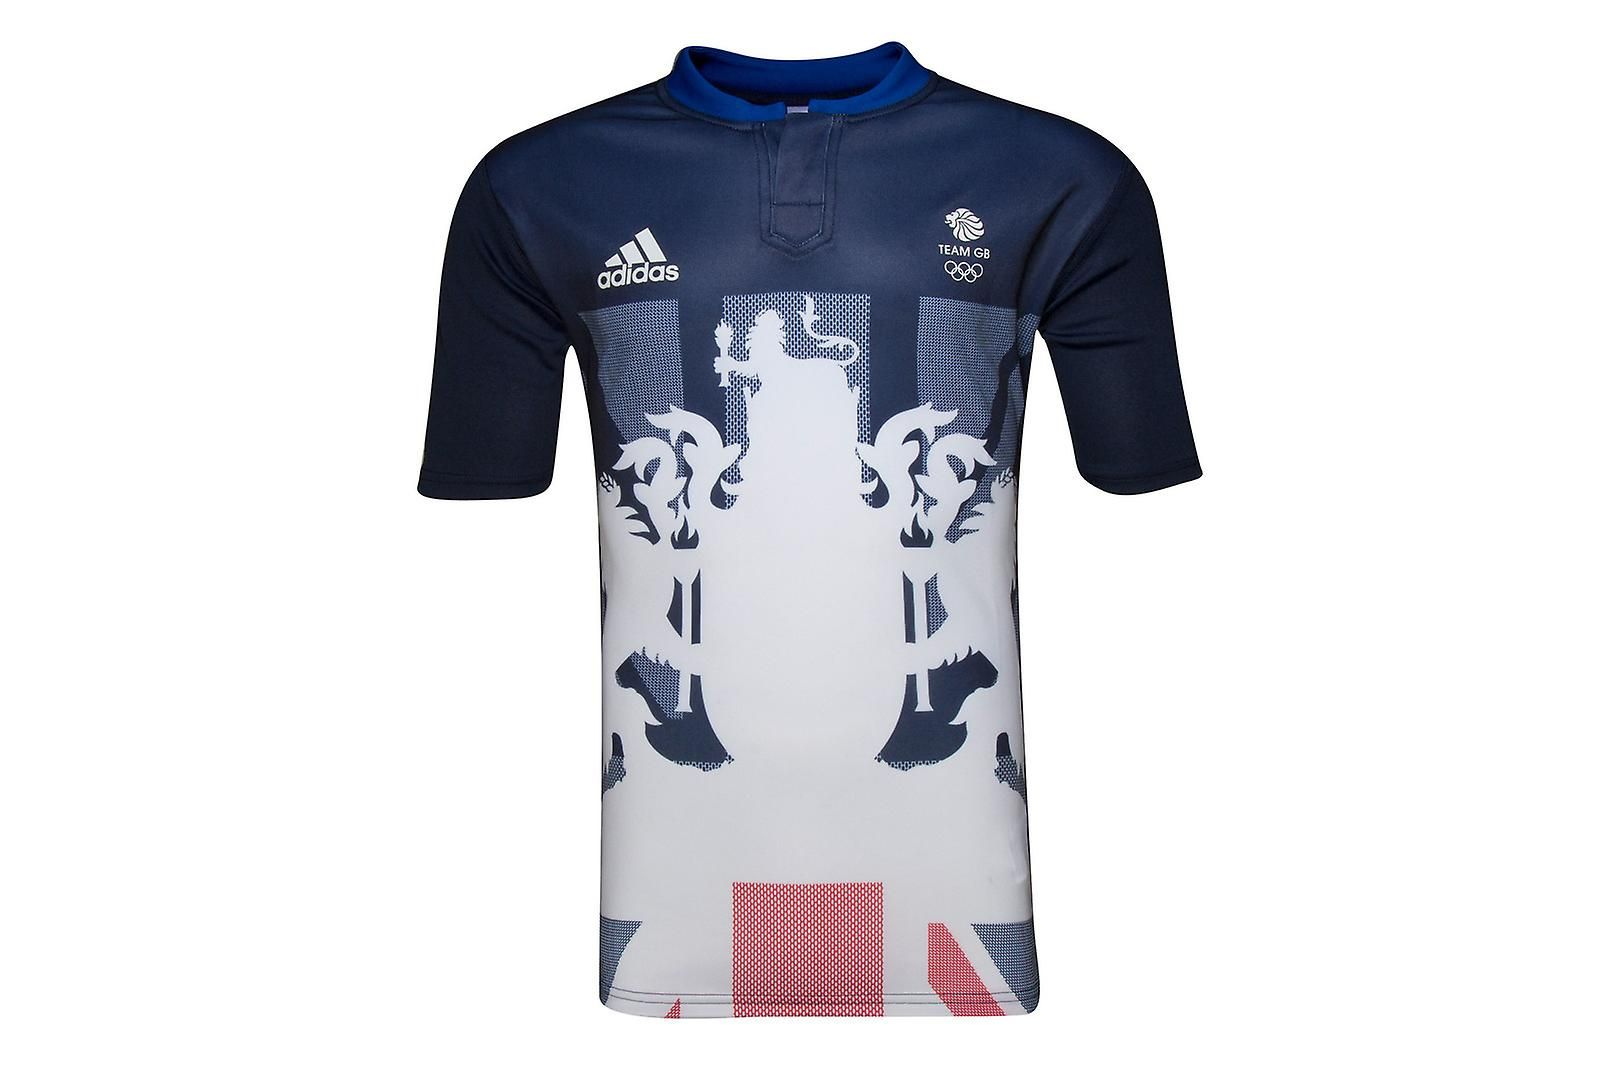 adidas Team GB 2016 Olympics Alternate S/S Rugby Shirt